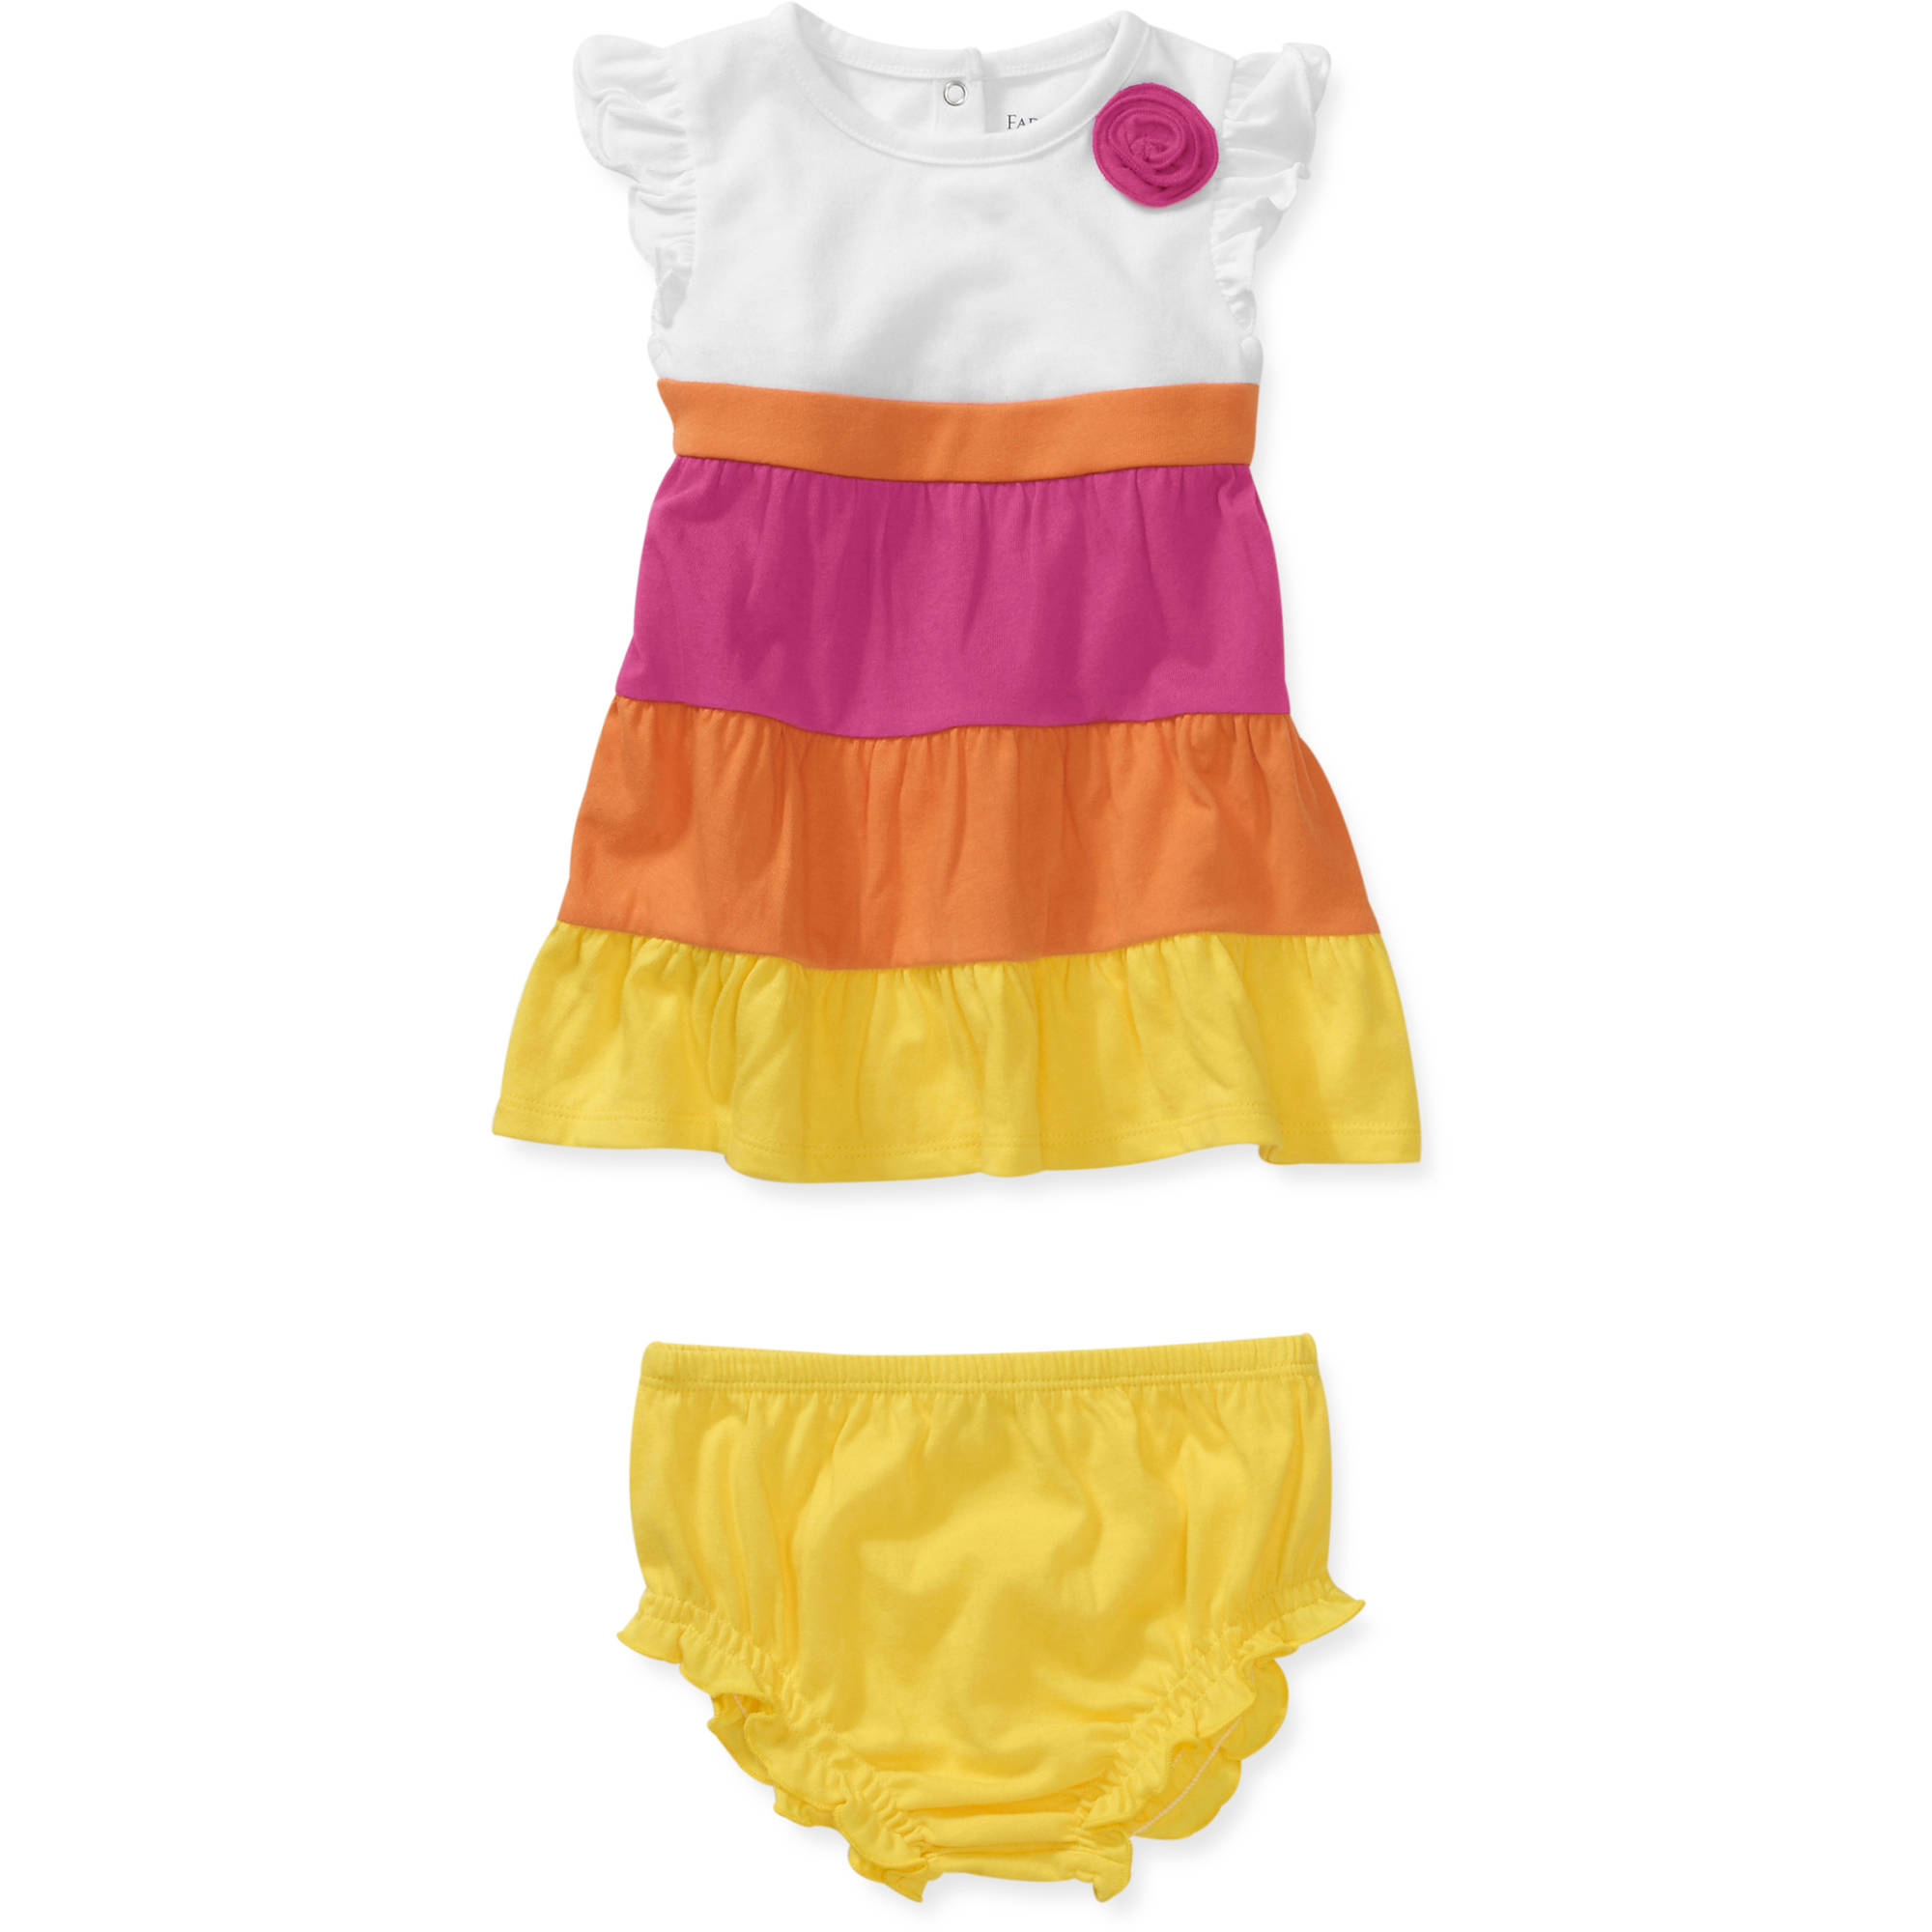 Faded Glory Newborn Girls' 2-Piece Knit Rainbow Tiered Dress and Bloomer Set